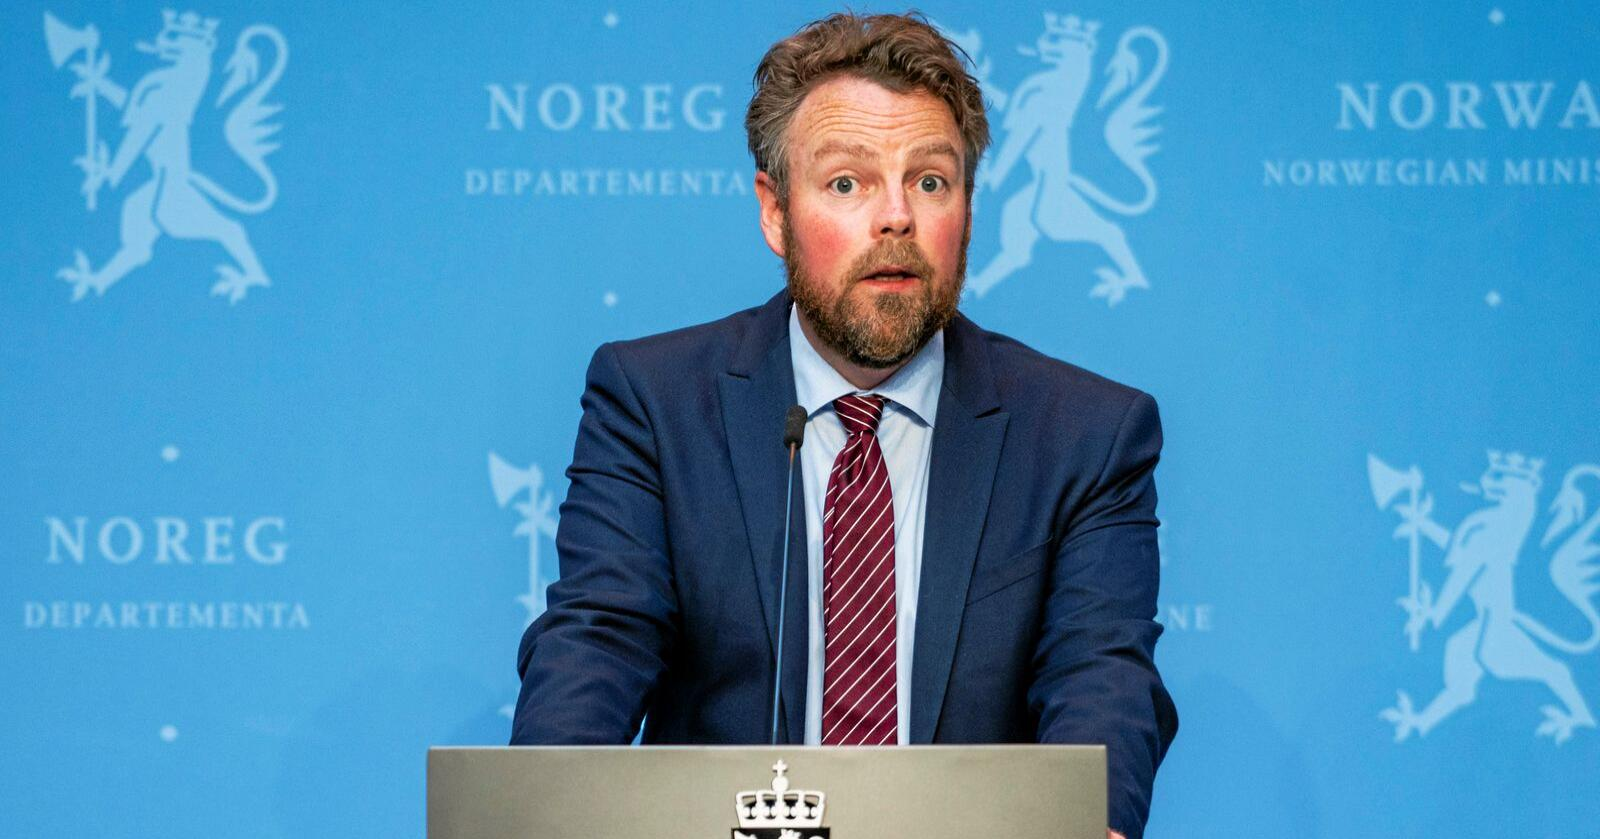 Bør reagere: Torbjørn Røe Isaksen (H) bør foreslå endringer i AAP-regelverket. Foto: Håkon Mosvold Larsen / NTB scanpix